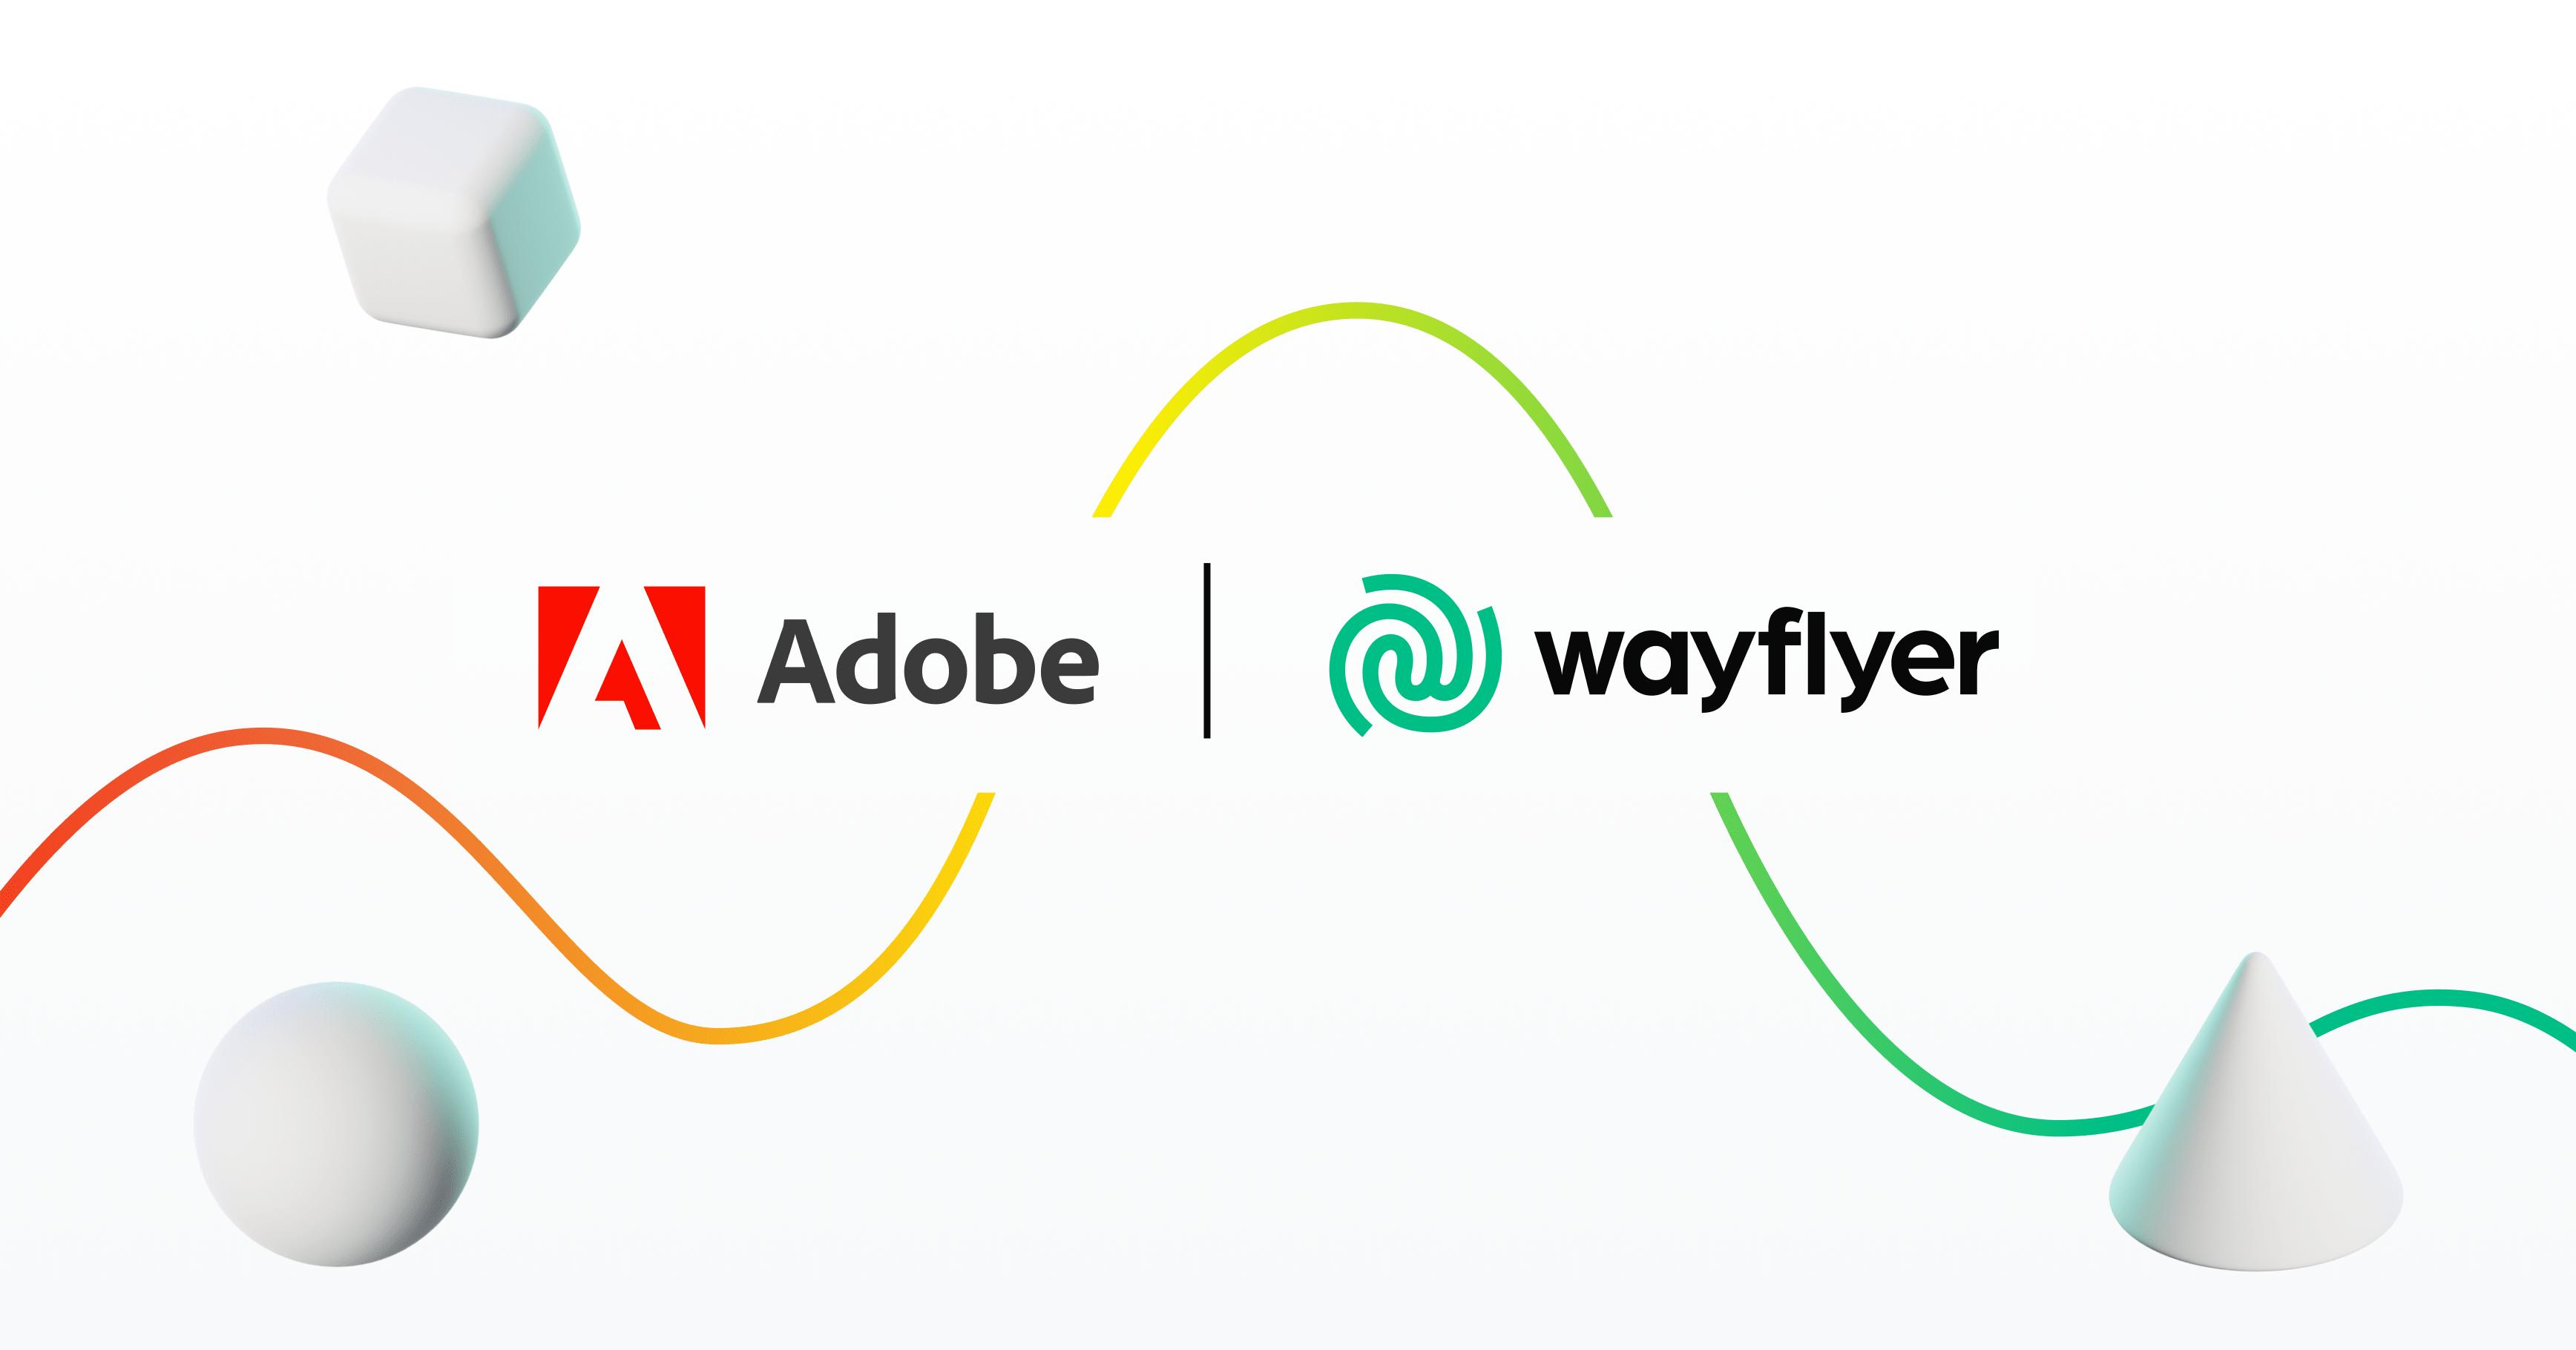 Adobe and Wayflyer